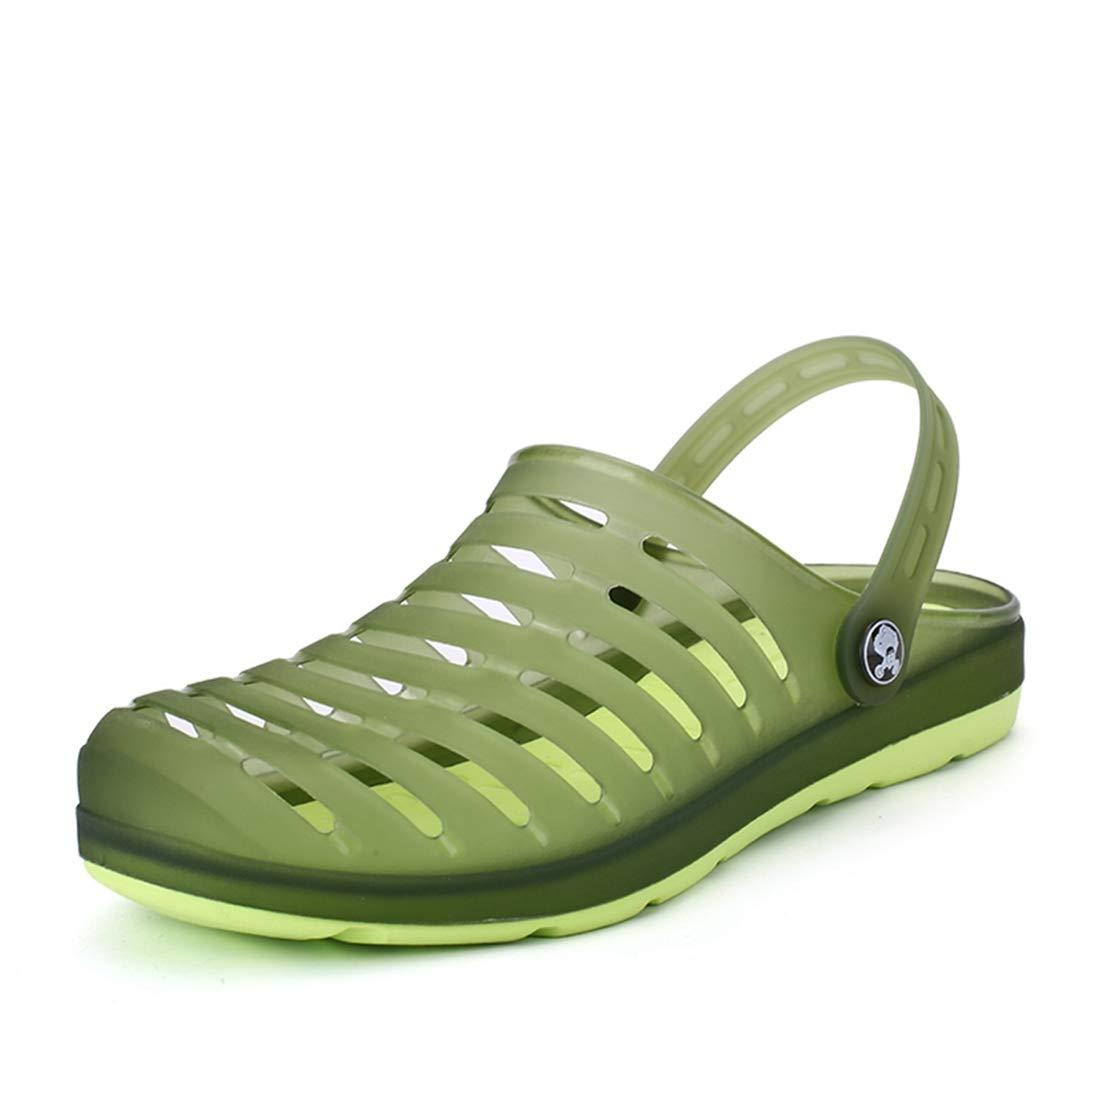 Men Garden Clogs Outdoor Walking Sandals Breathable Sport Slides Summer Non Slip Pool Beach Shower Slippers Shoes Army Green 275mm:11 D(M) US Men